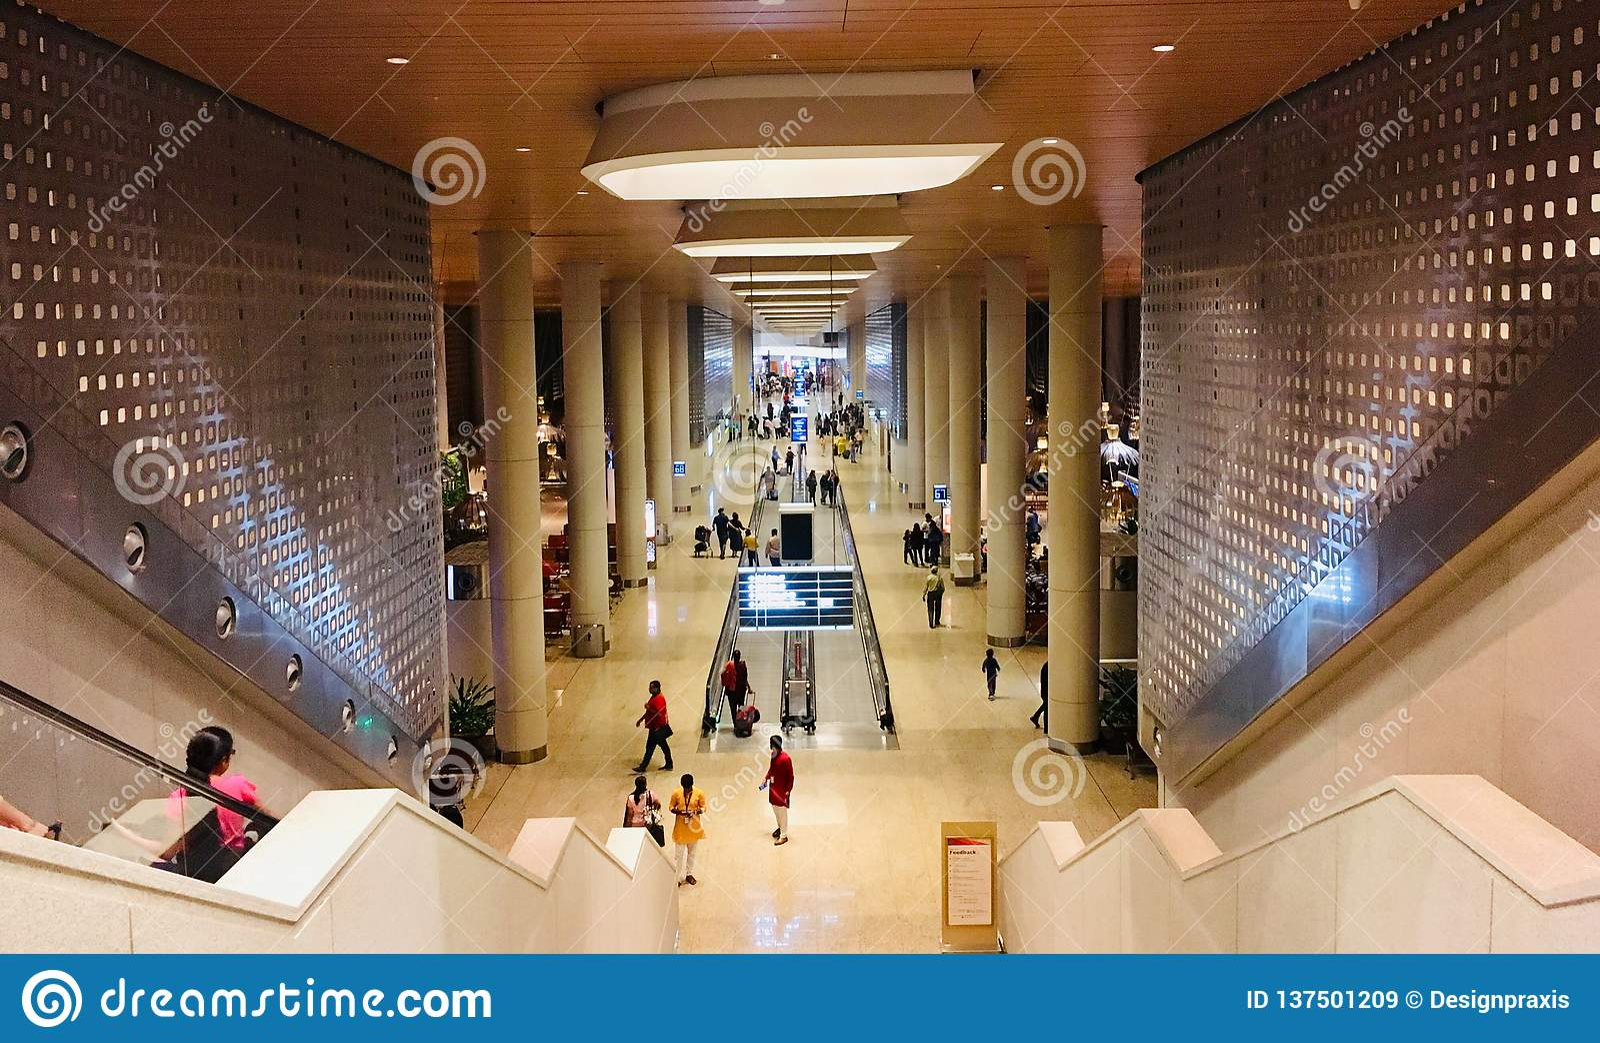 Departure Hall Of Chhatrapati Shivaji Maharaj International